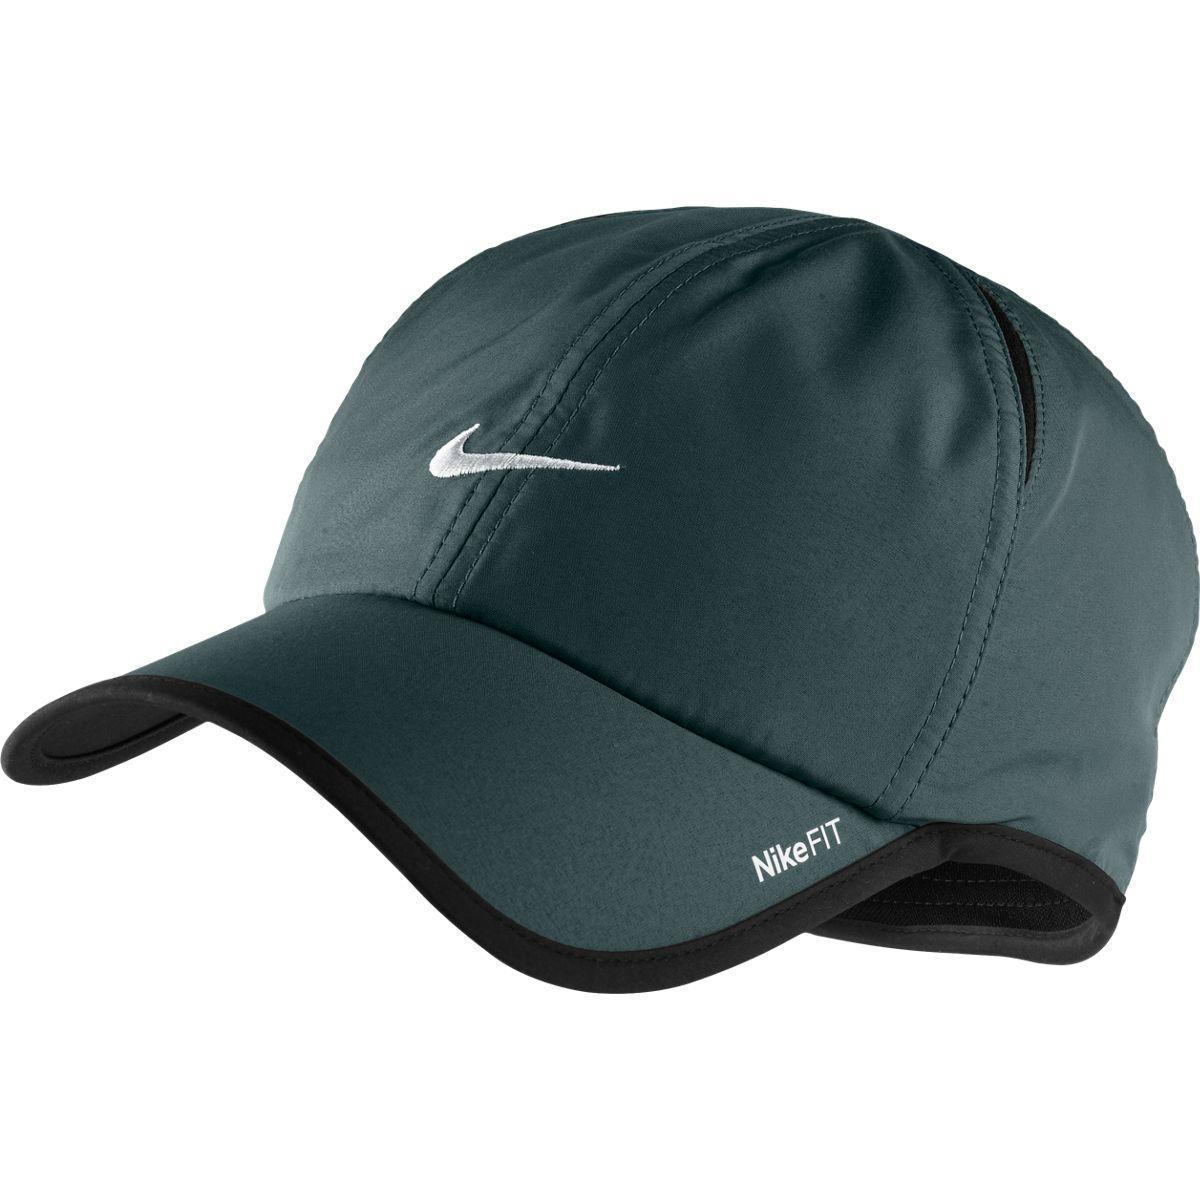 Nike Mens Dri Fit Featherlite Cap Dark Blue Tennisnuts Com